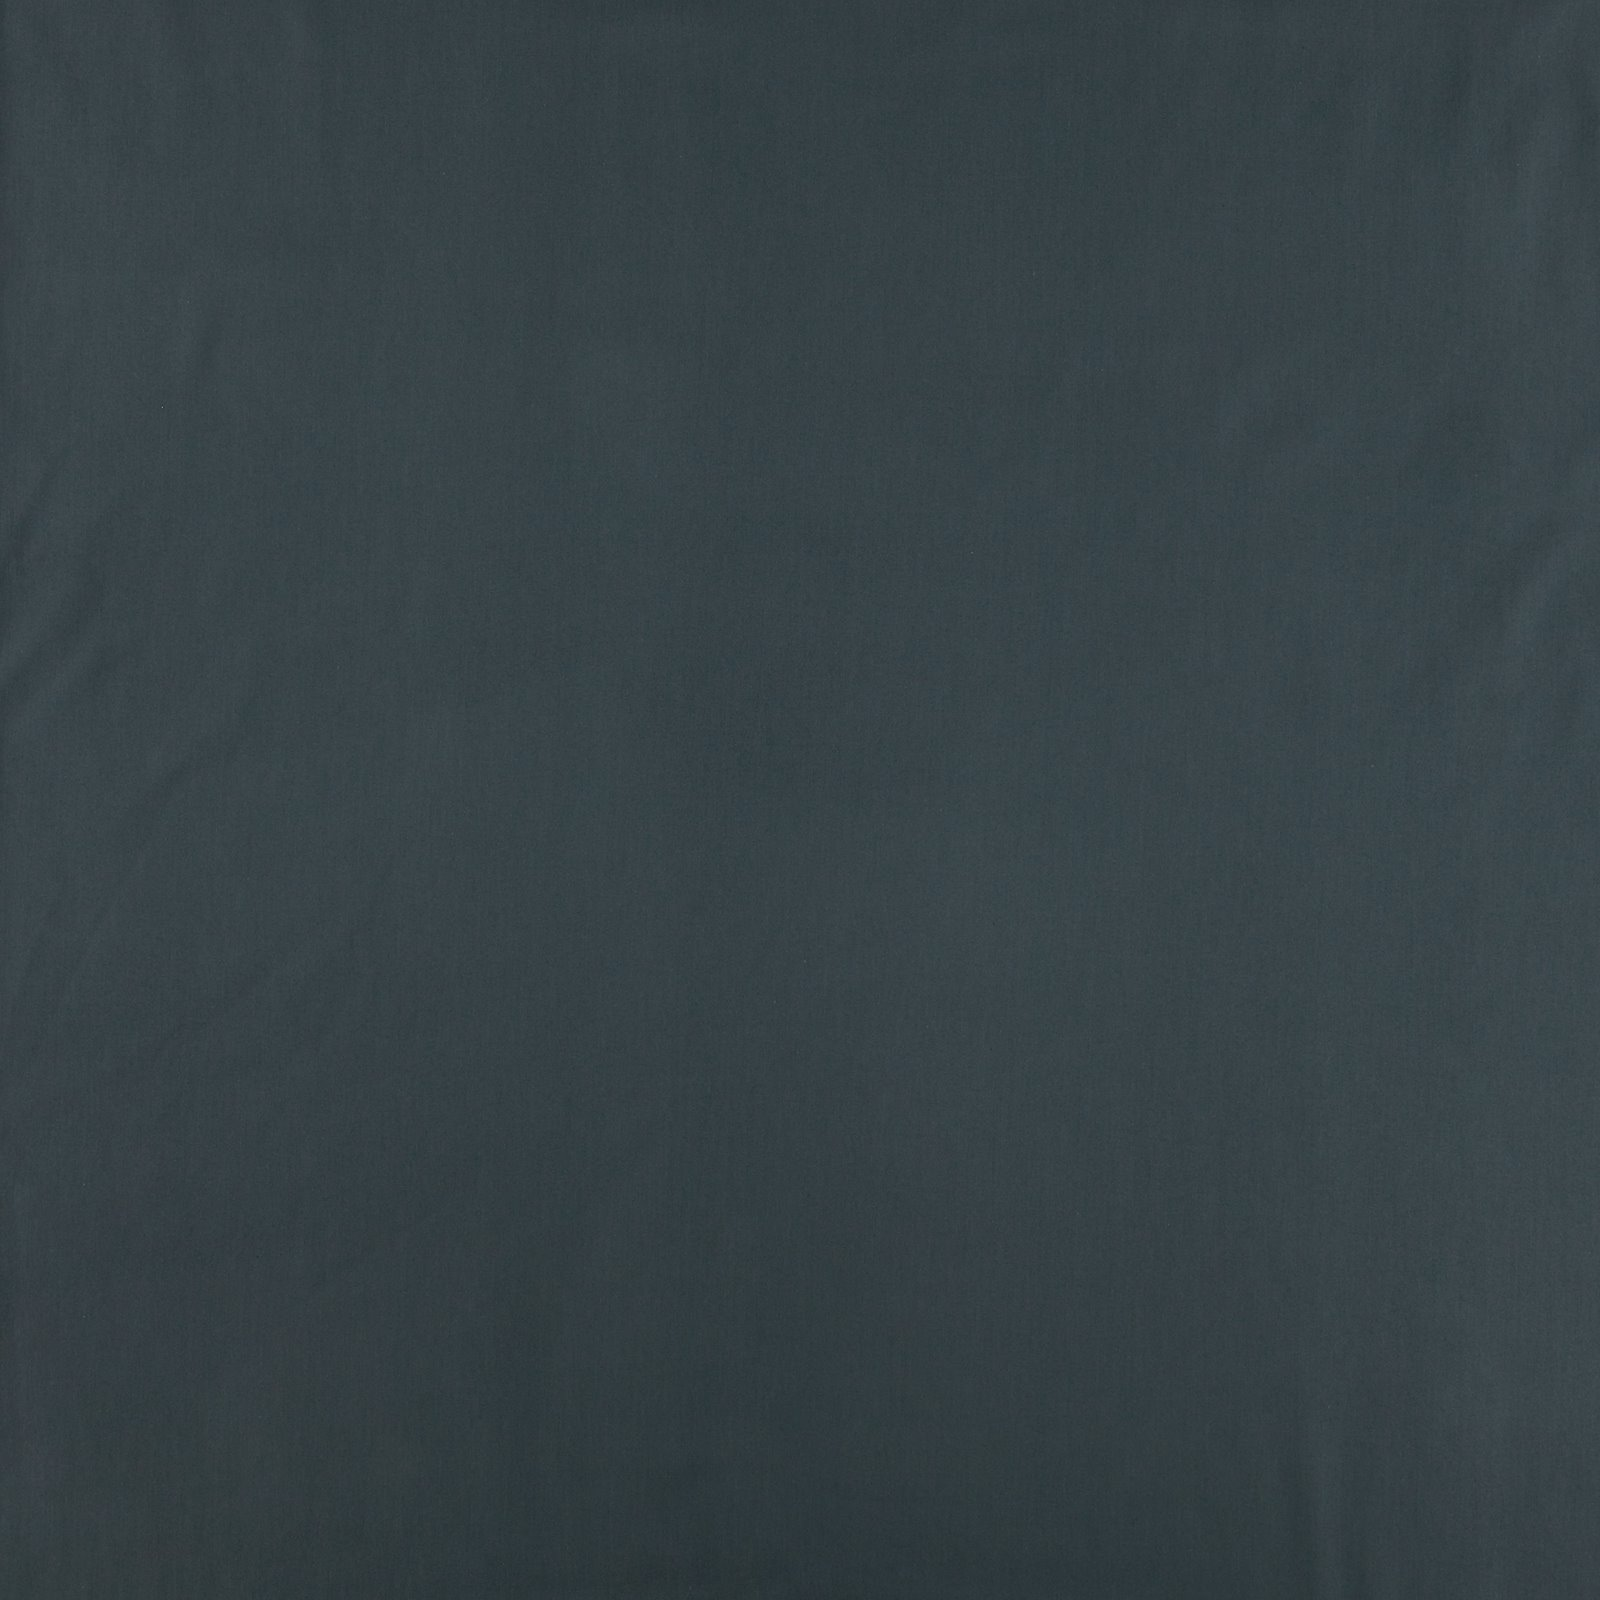 Cotton satin dark petrol blue 816167_pack_solid